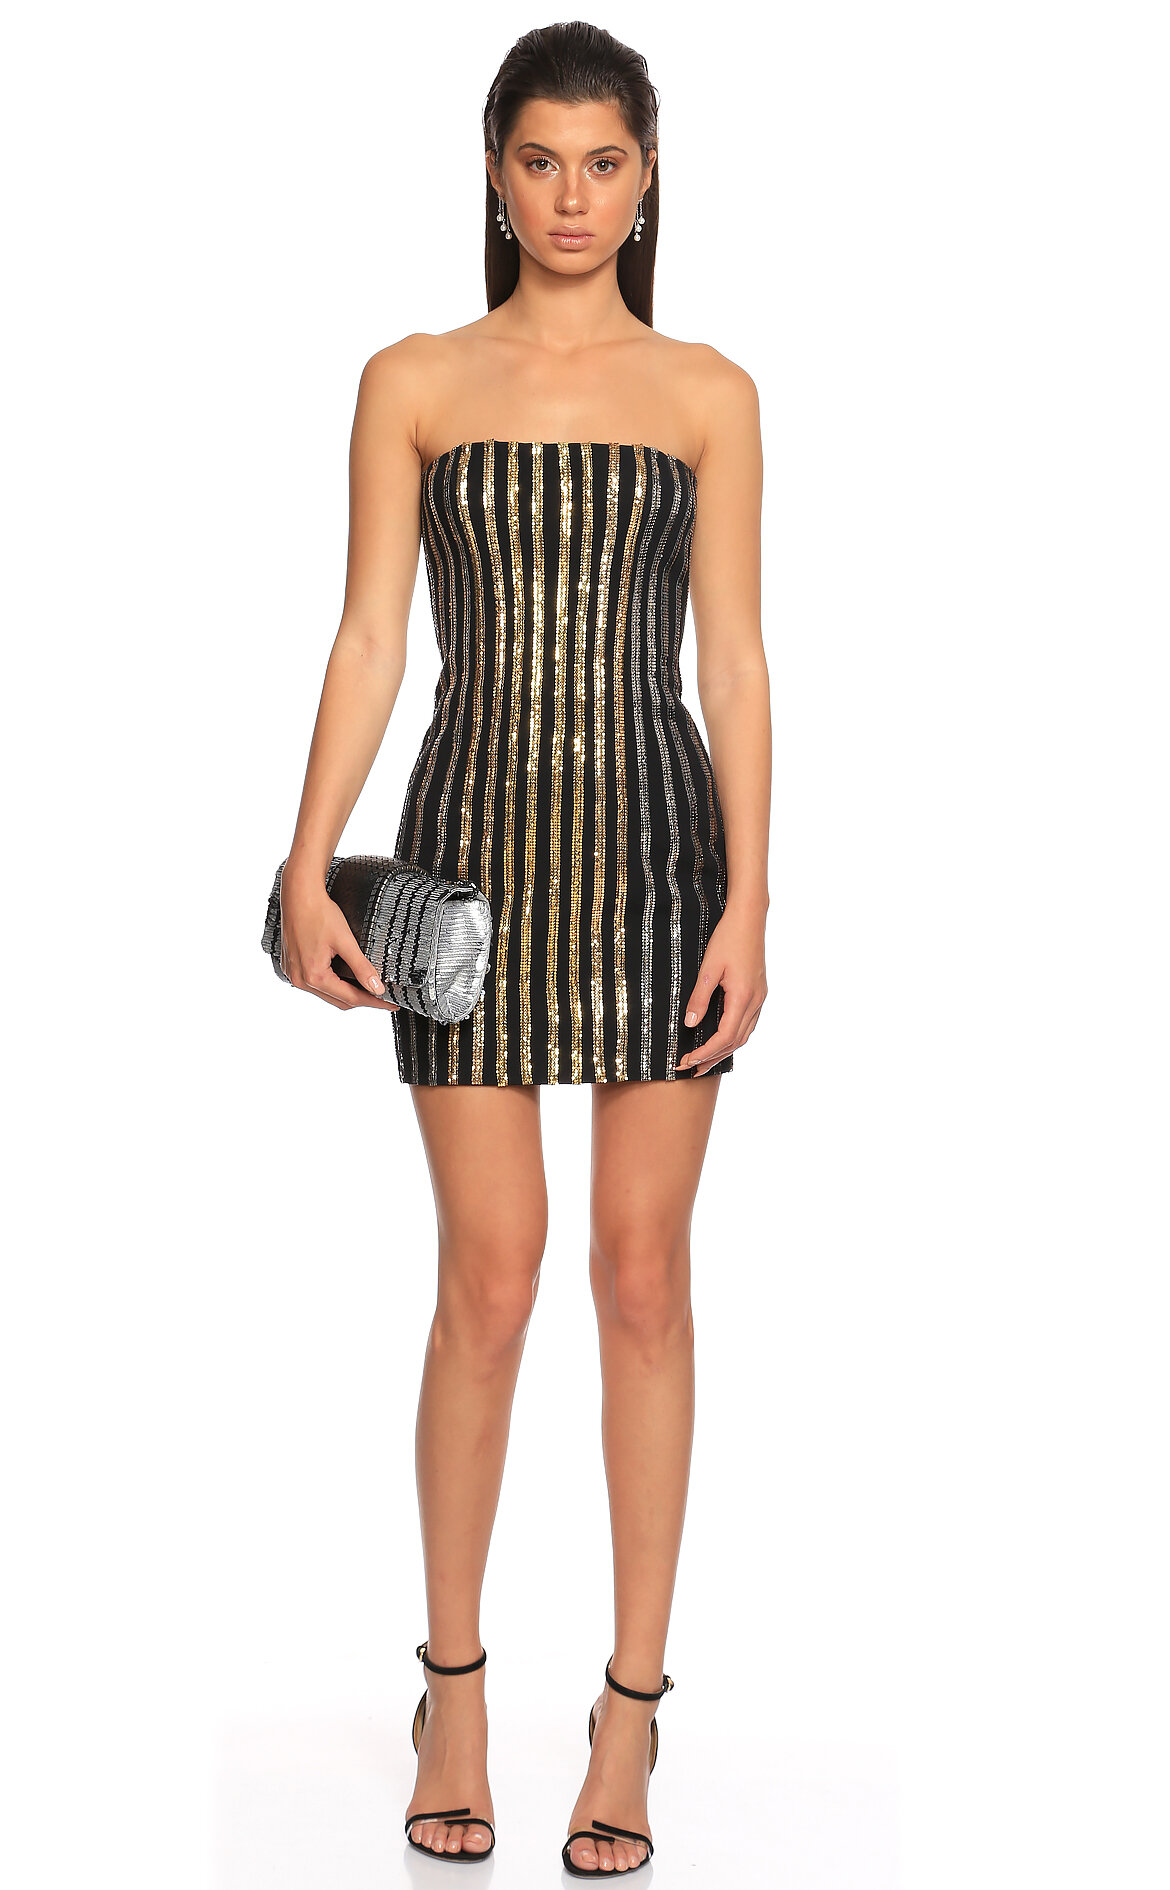 Balmain-Balmain Pul Payet Straplez Mini Siyah Silver Elbise